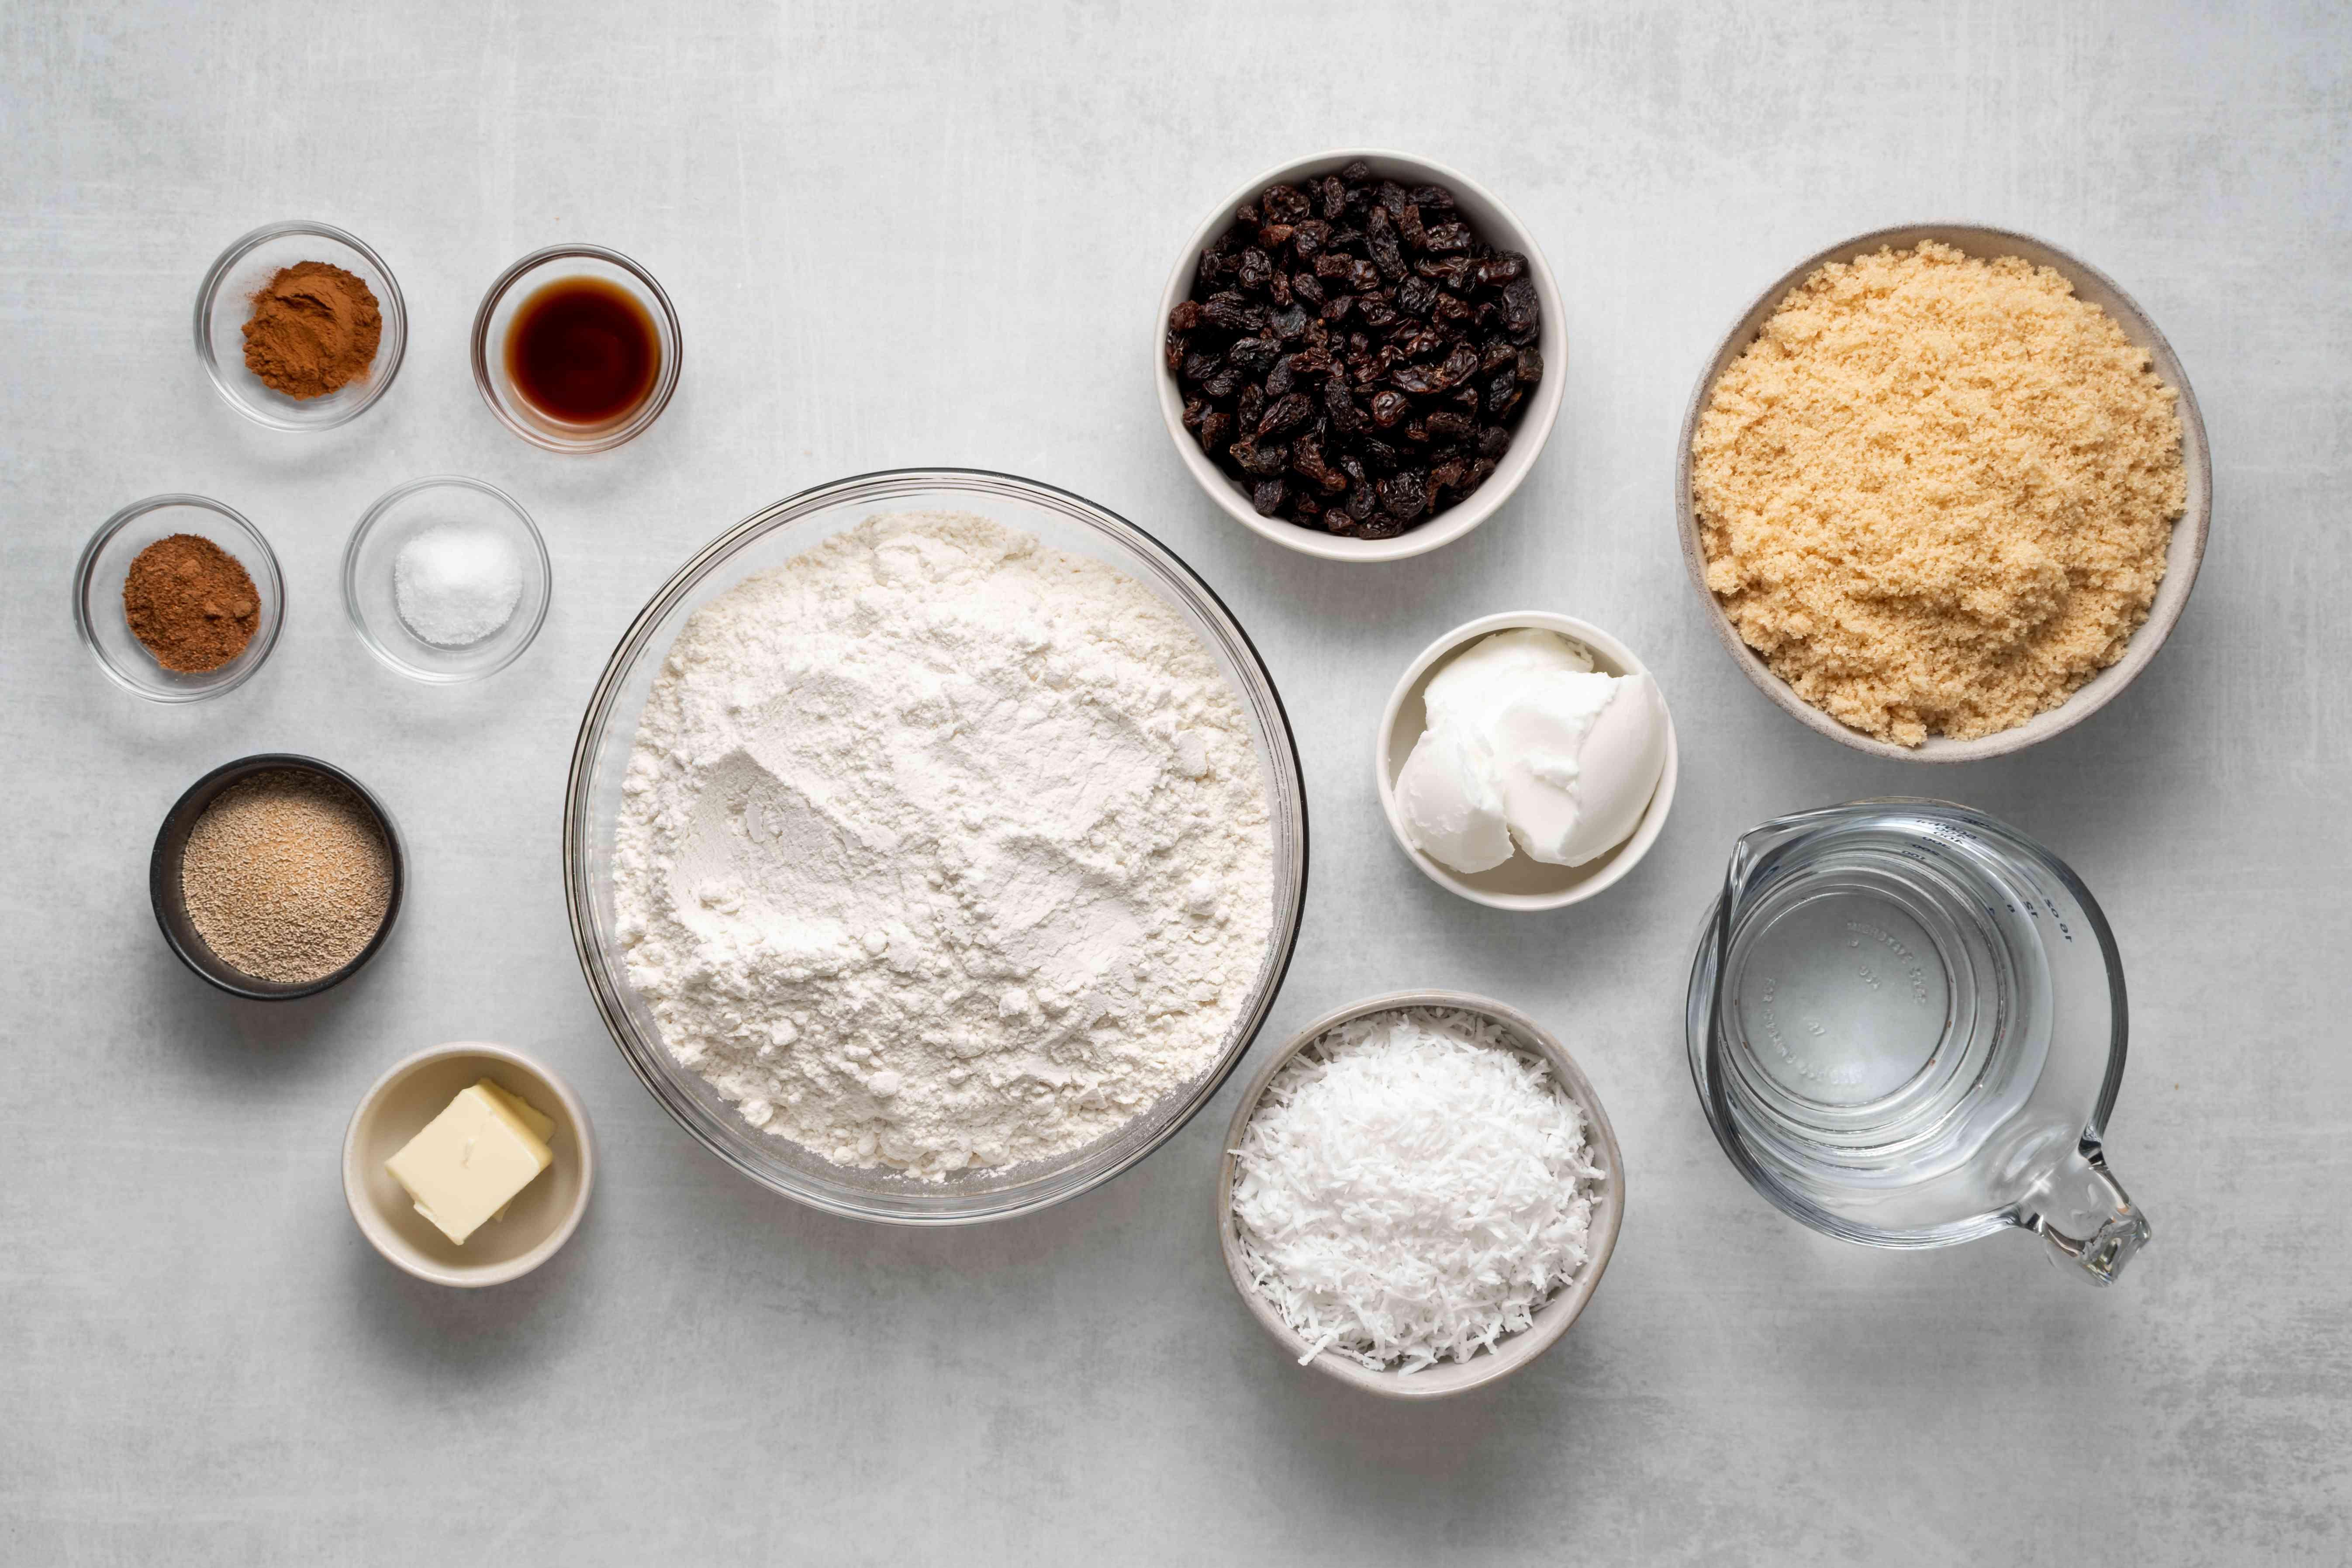 Antigua's Raisin Bun ingredients